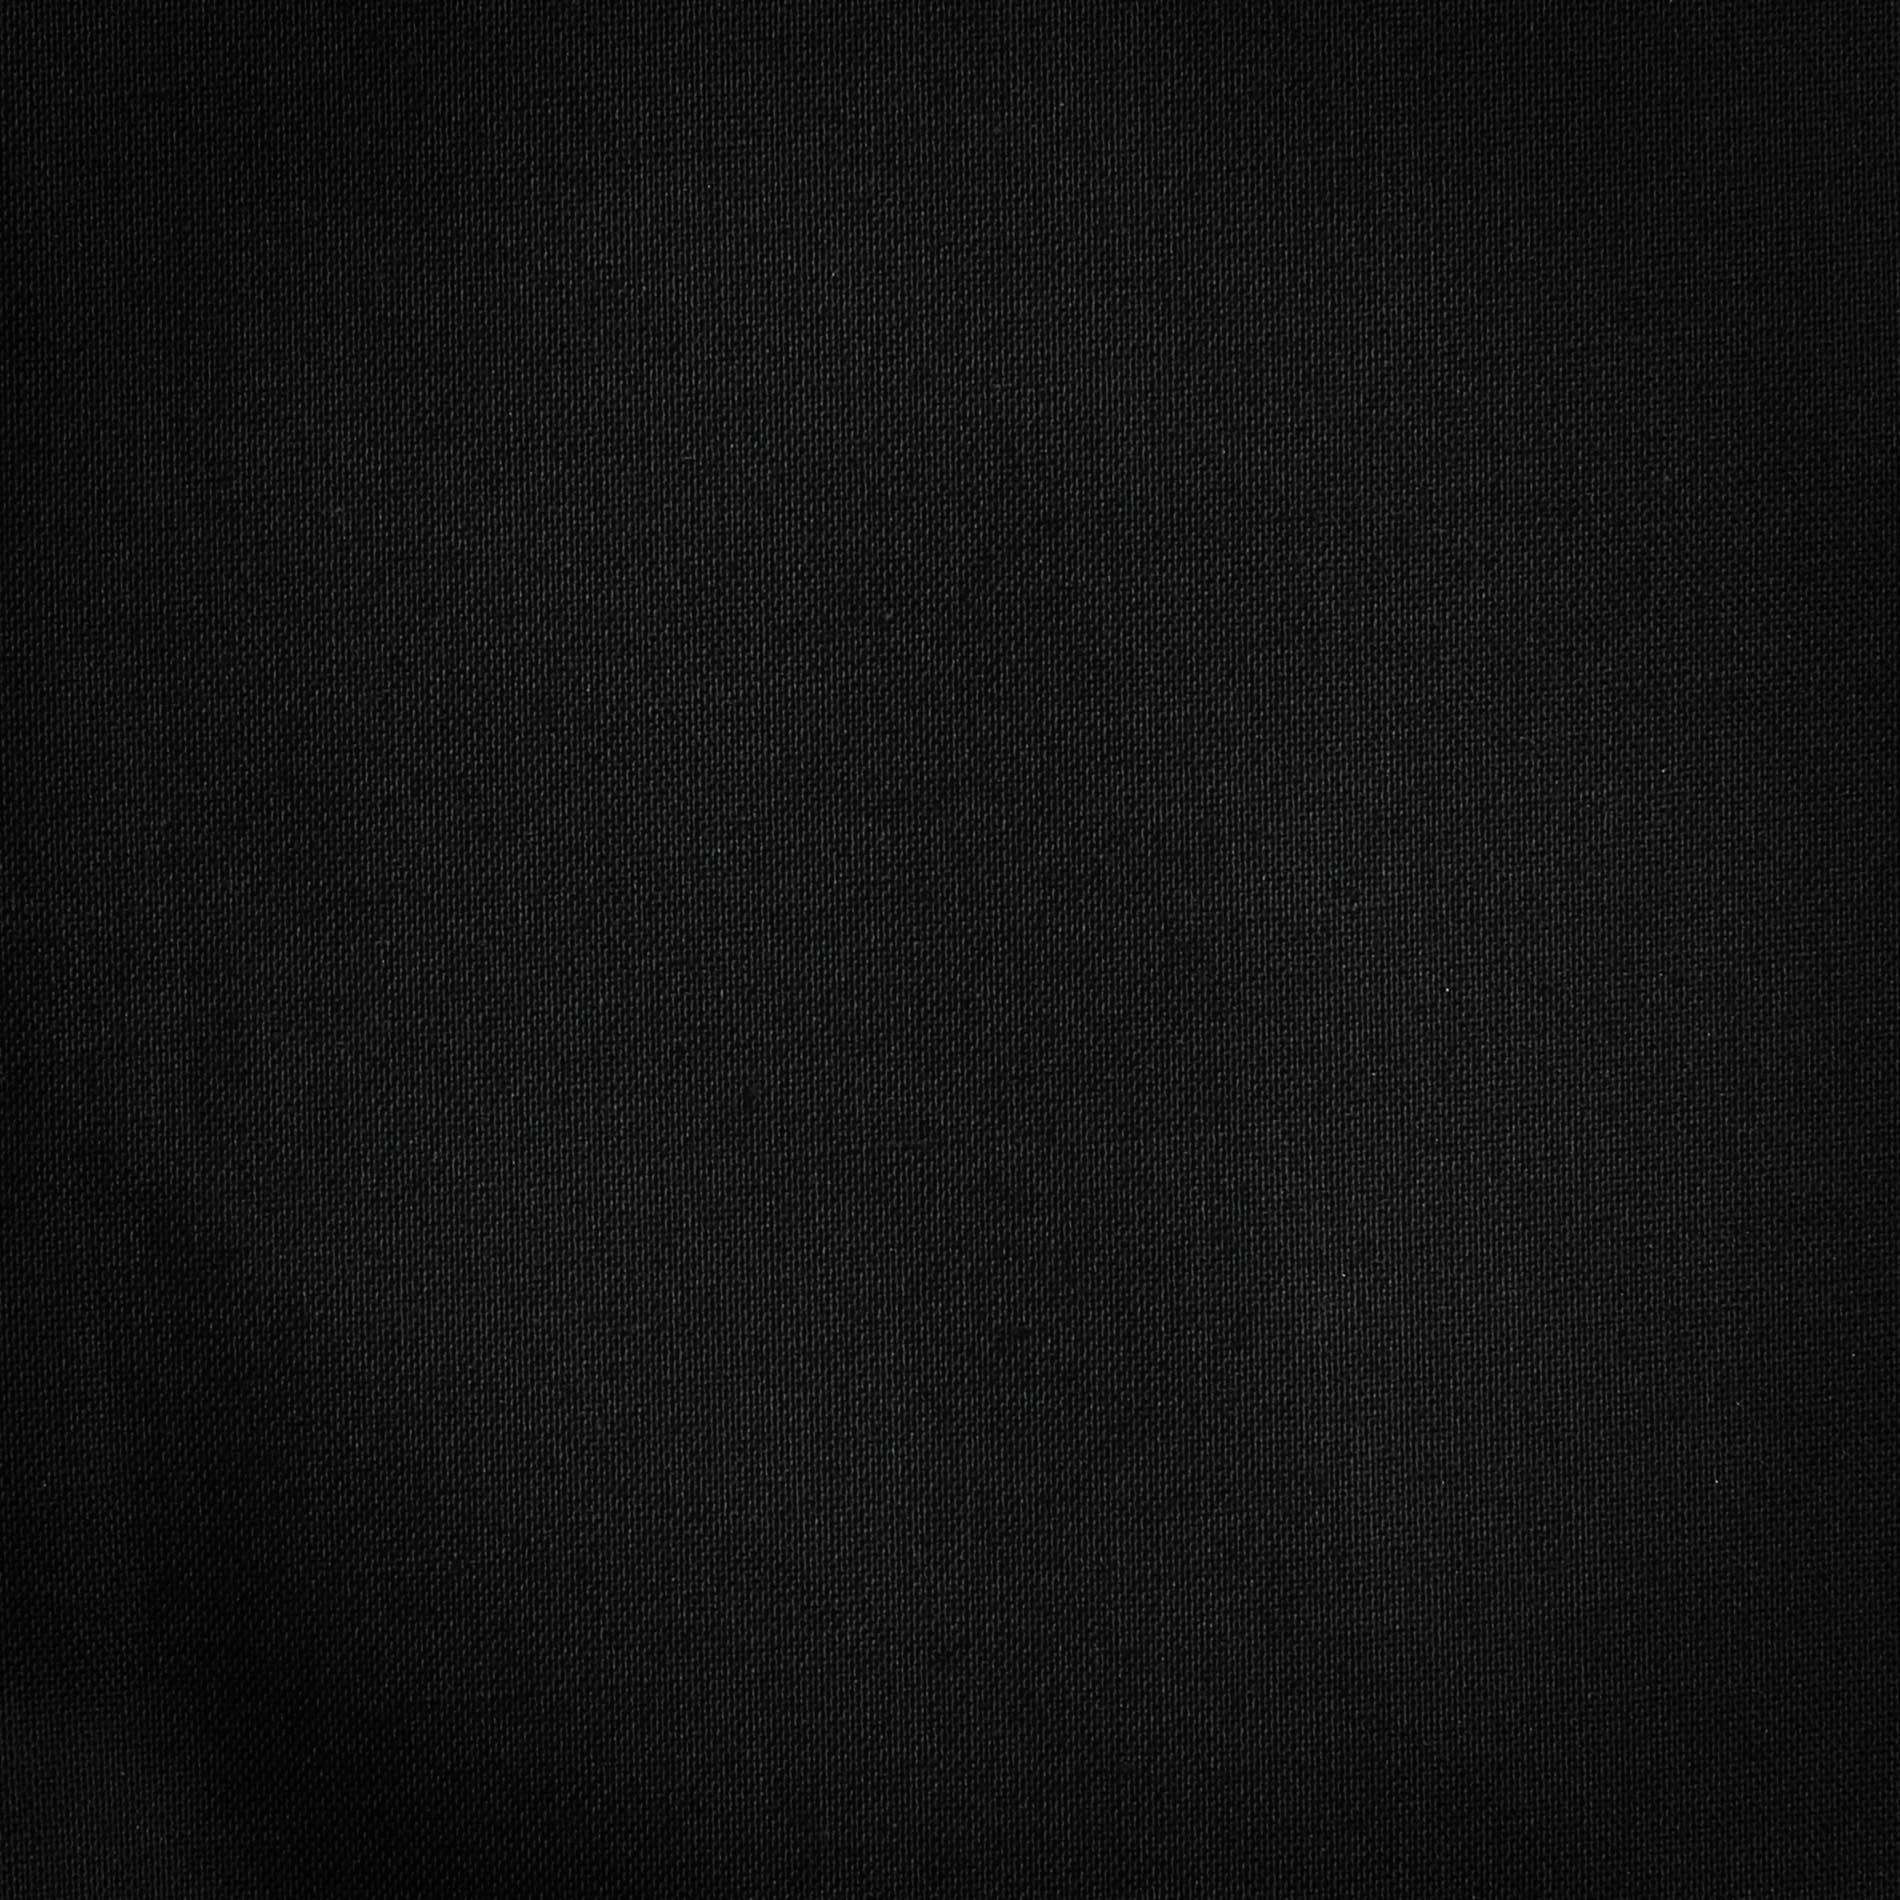 【MACKINTOSH】【DUNKELD】RAINTECコットン ステンカラーコート